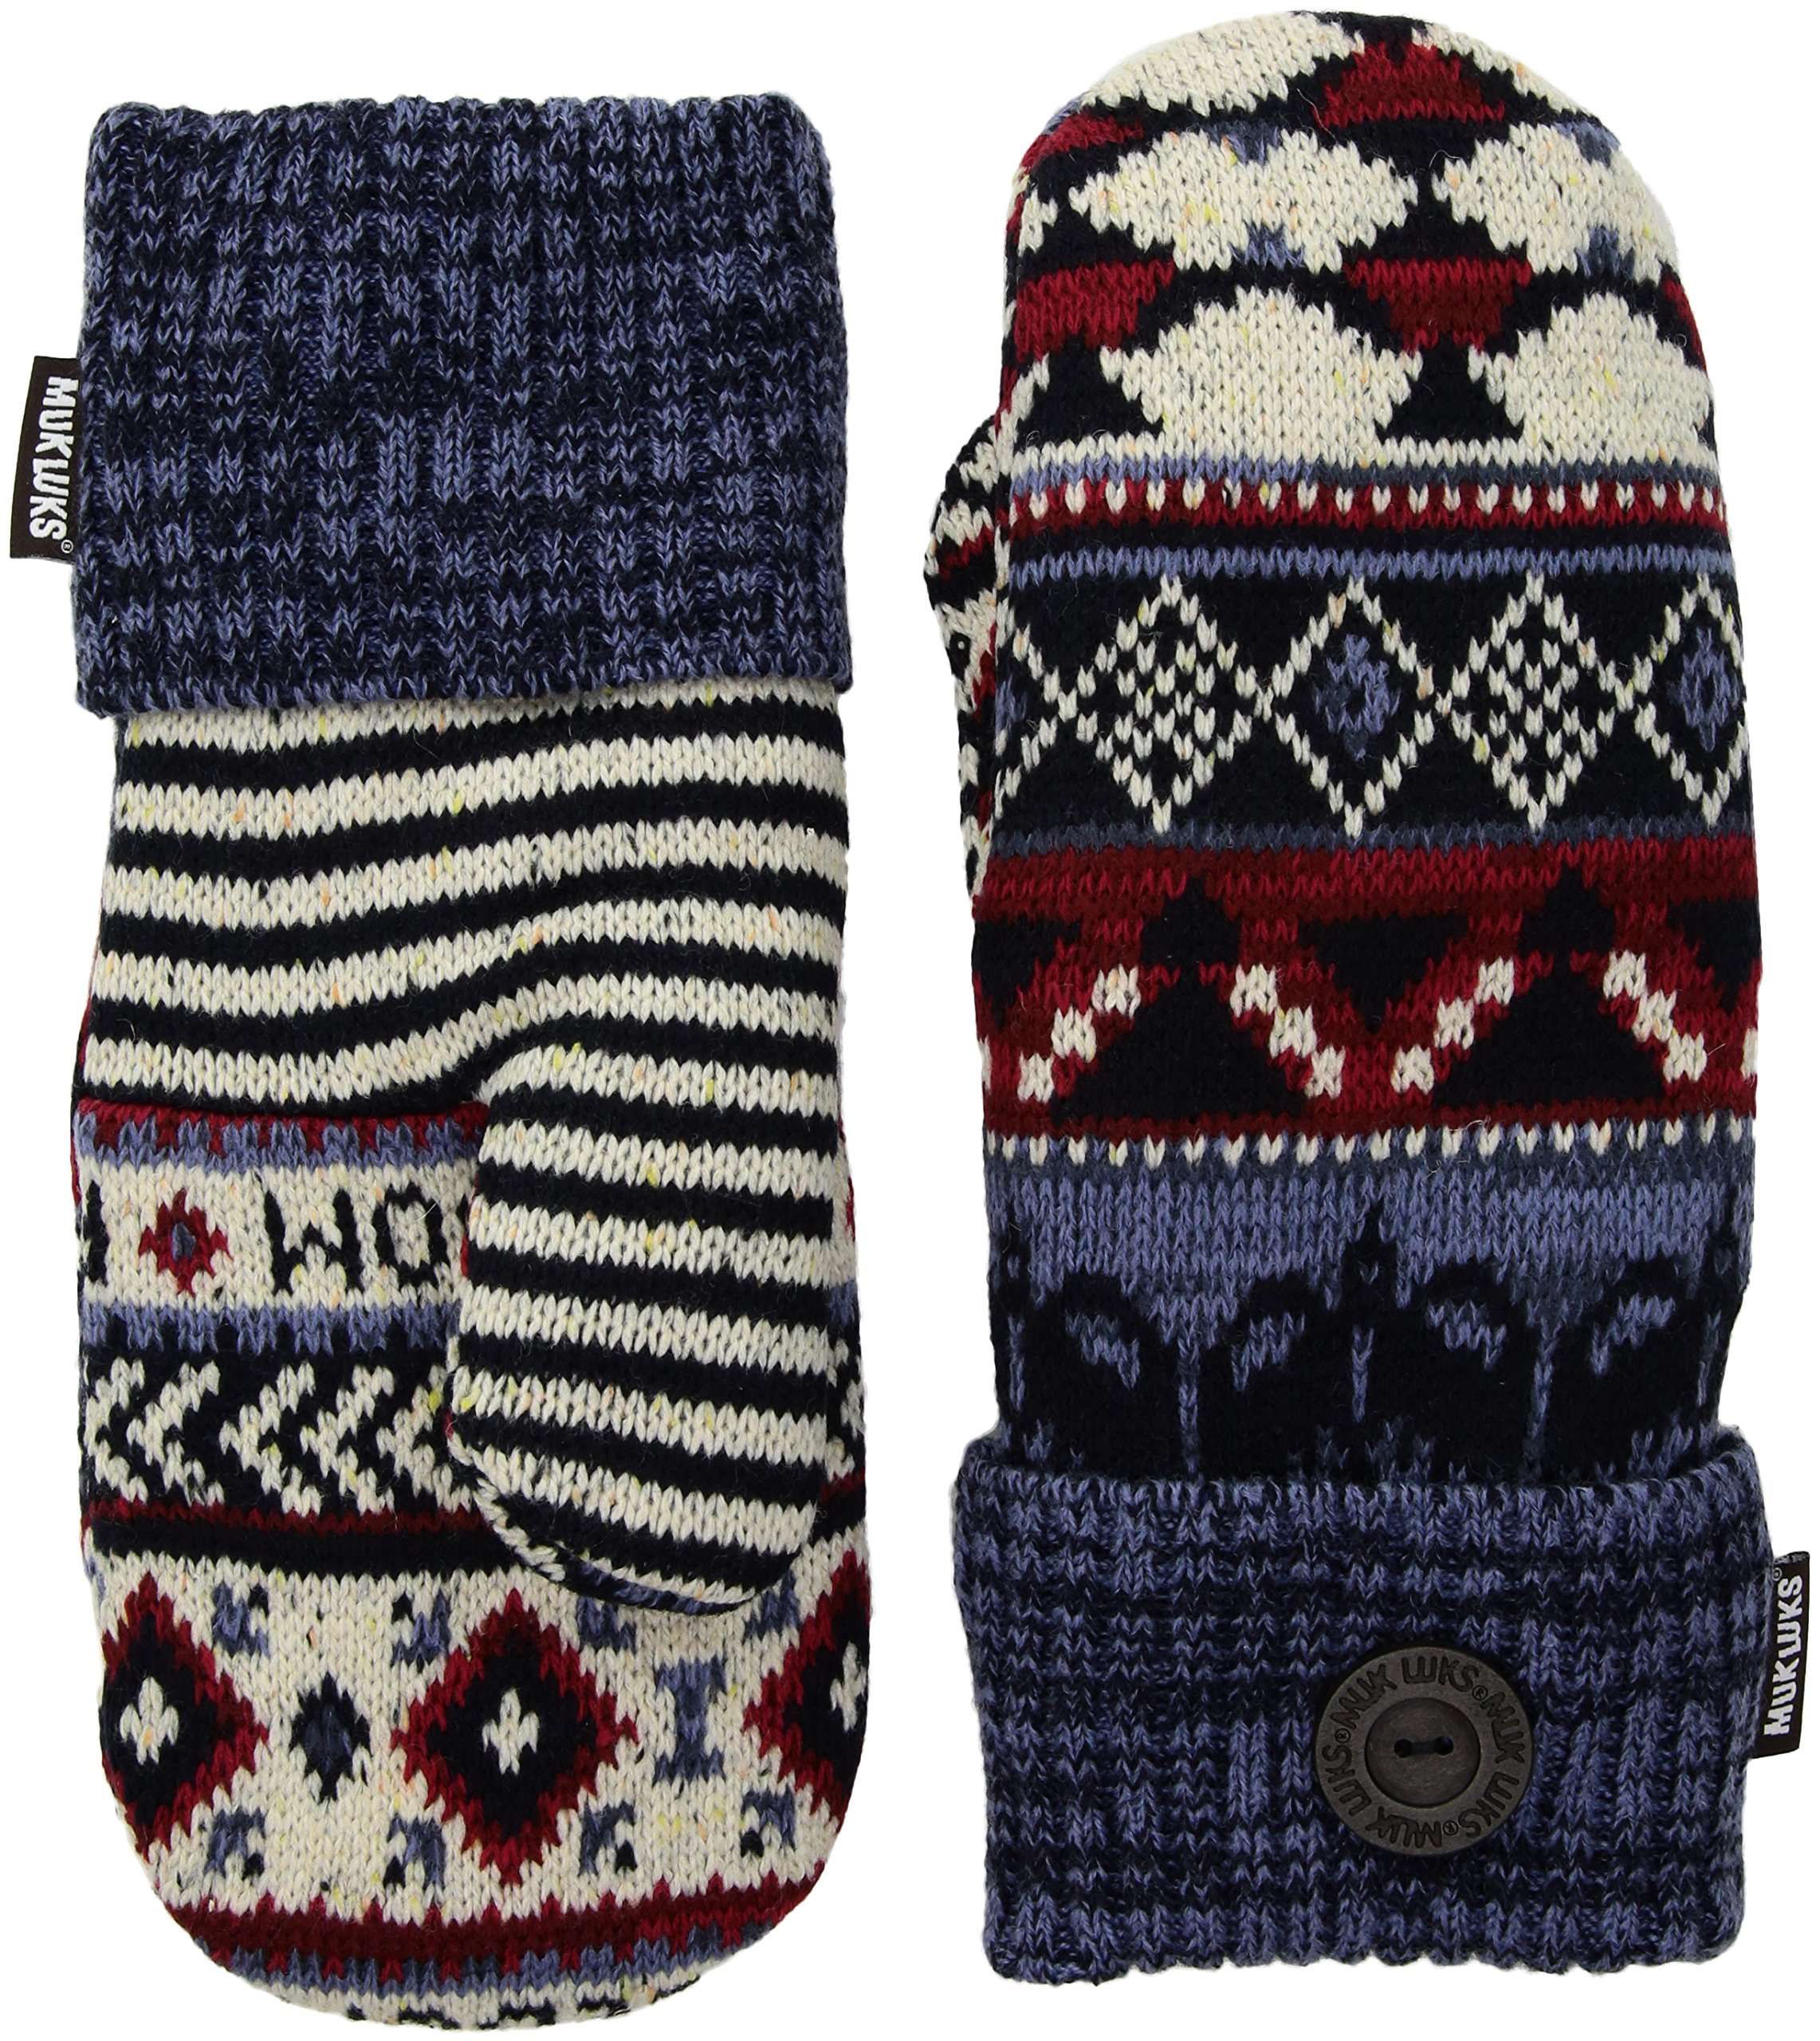 Muk Luks Women's Potholder Mittens, multi, One Size